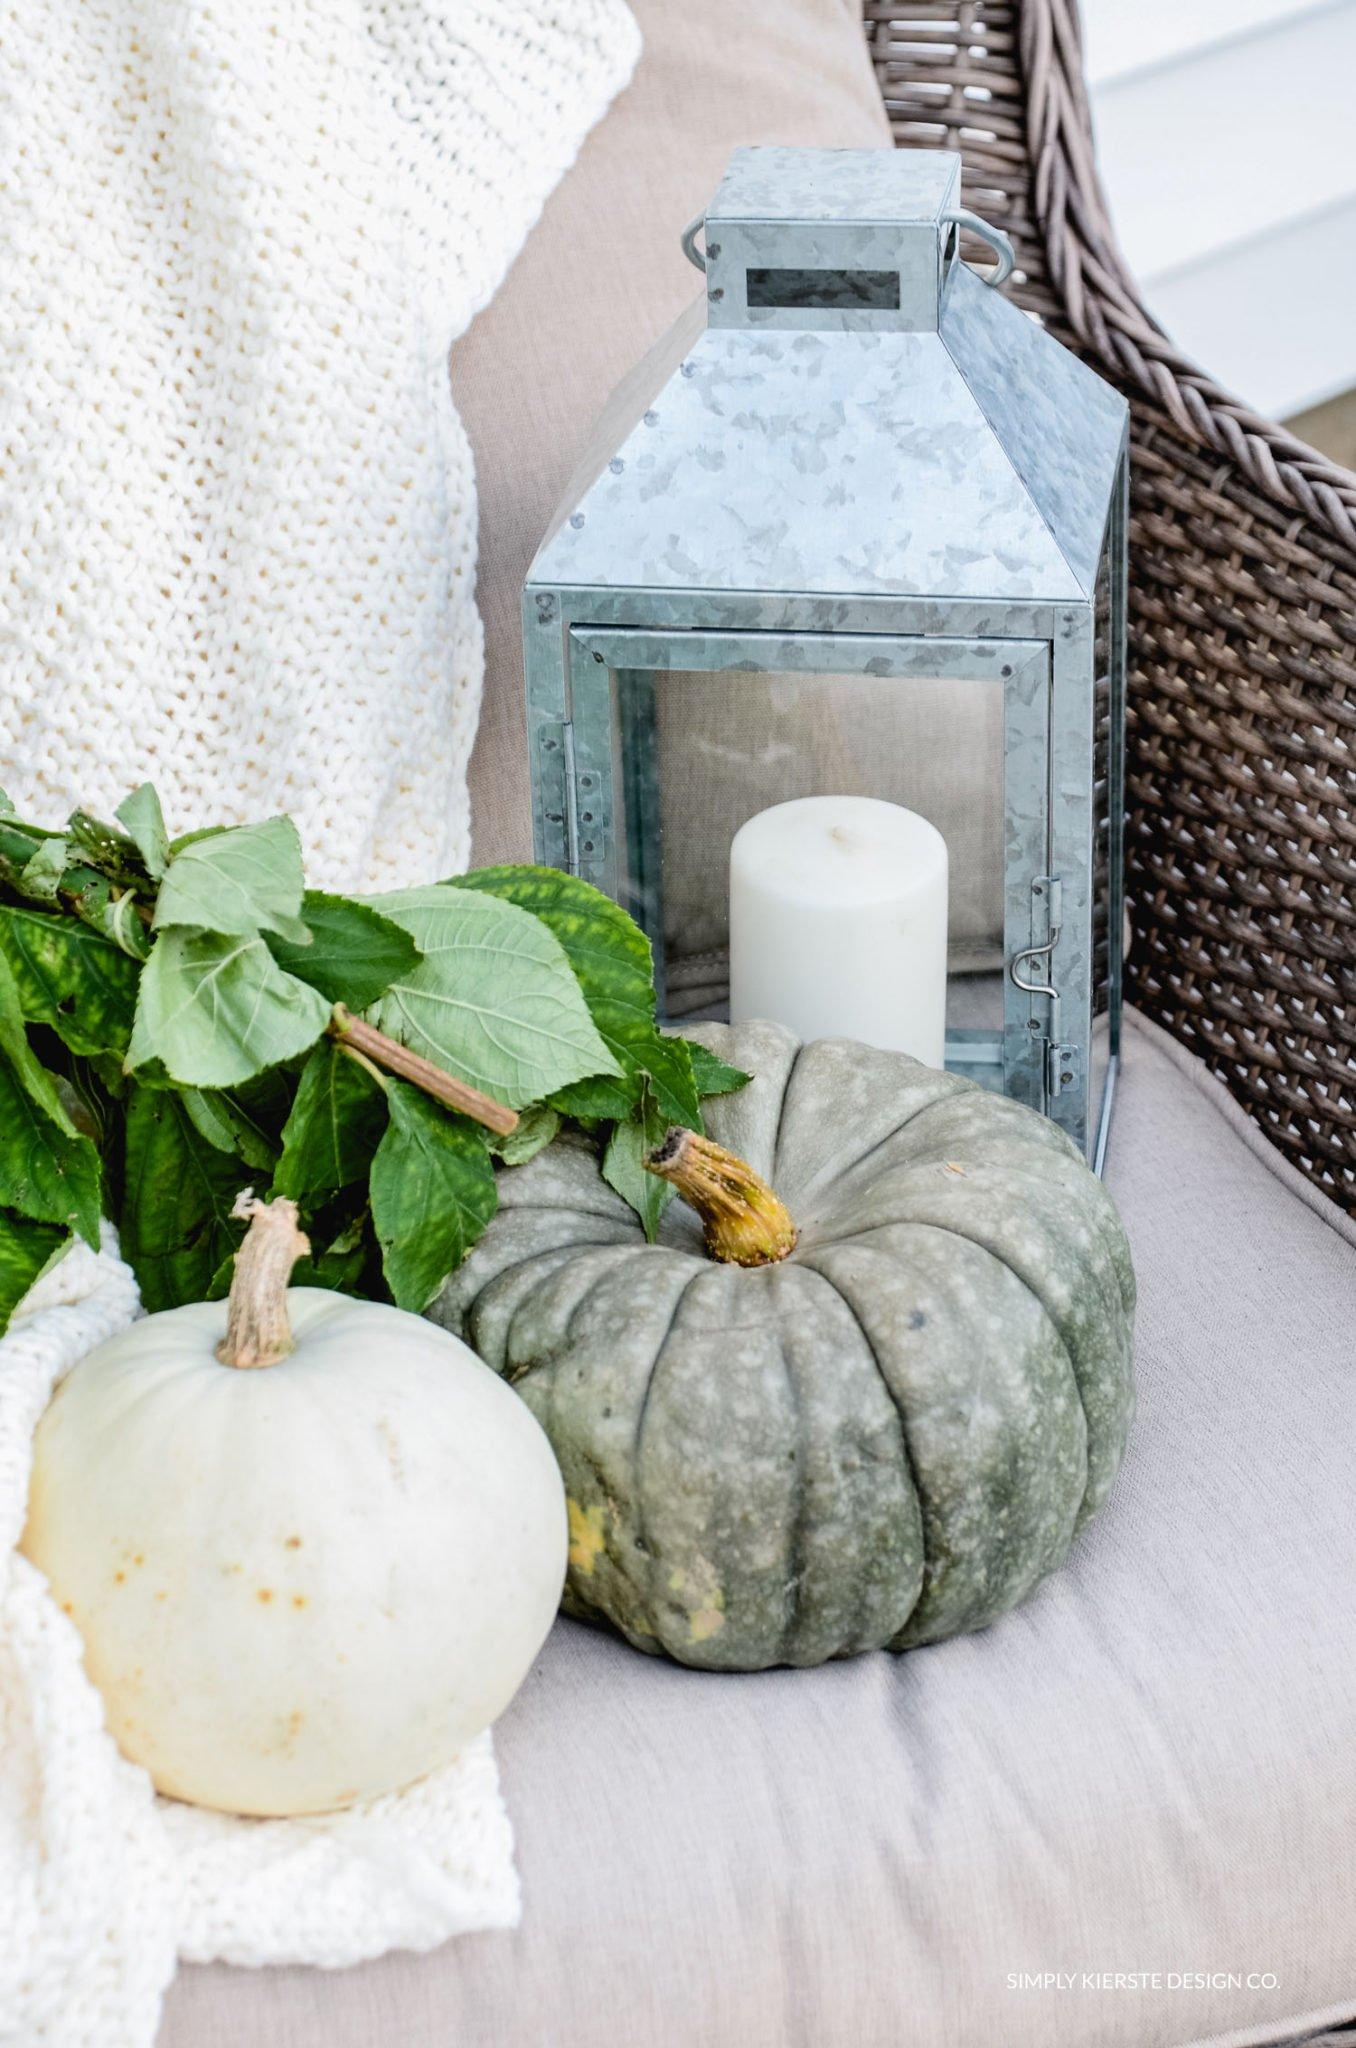 Simple Fall Porch | Better Homes & Gardens | Easy Fall Porch Ideas | simplykierste.com